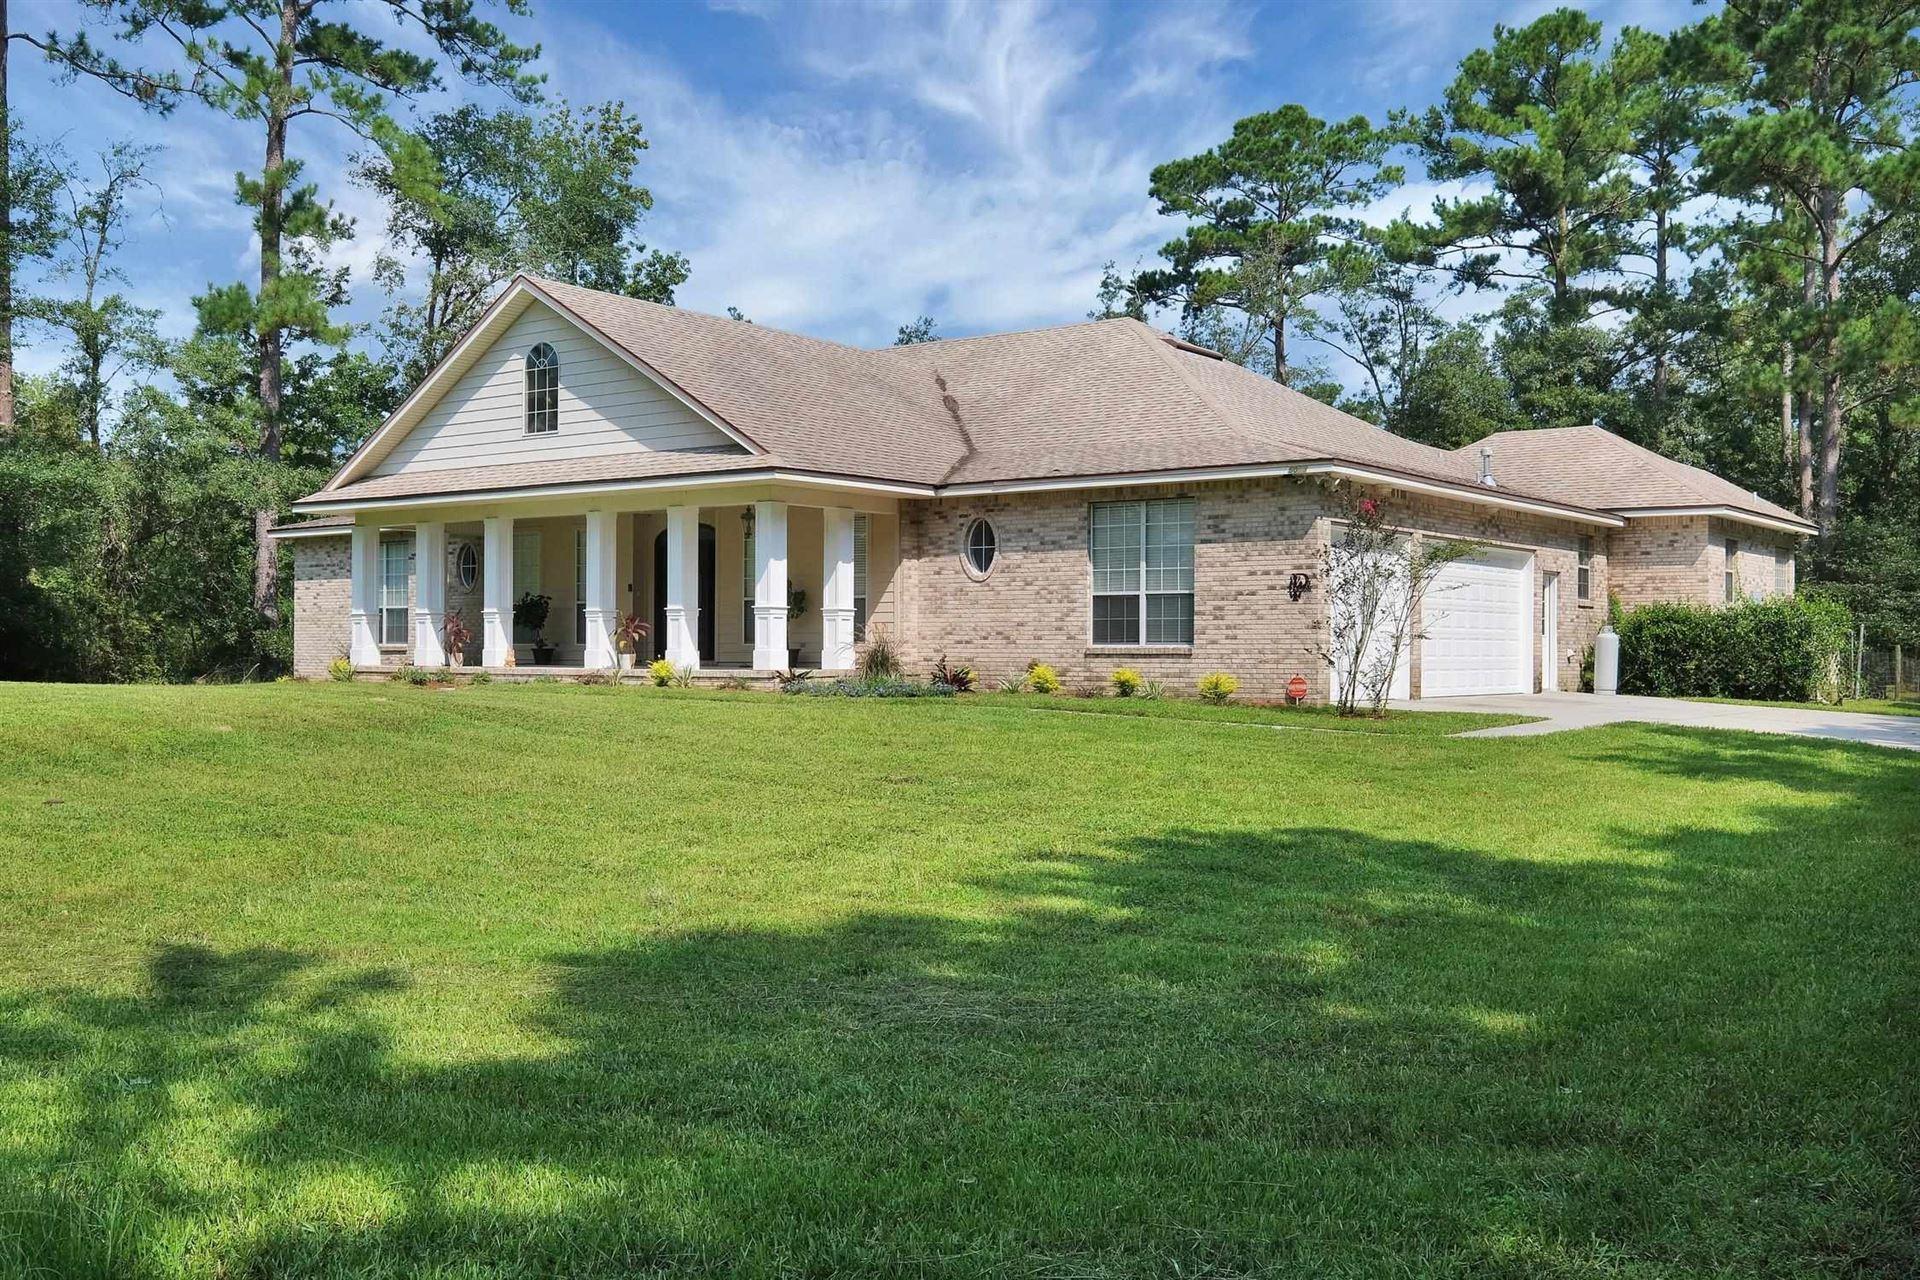 Photo of 5013 Lannie Road, JACKSONVILLE, FL 32218 (MLS # 336555)